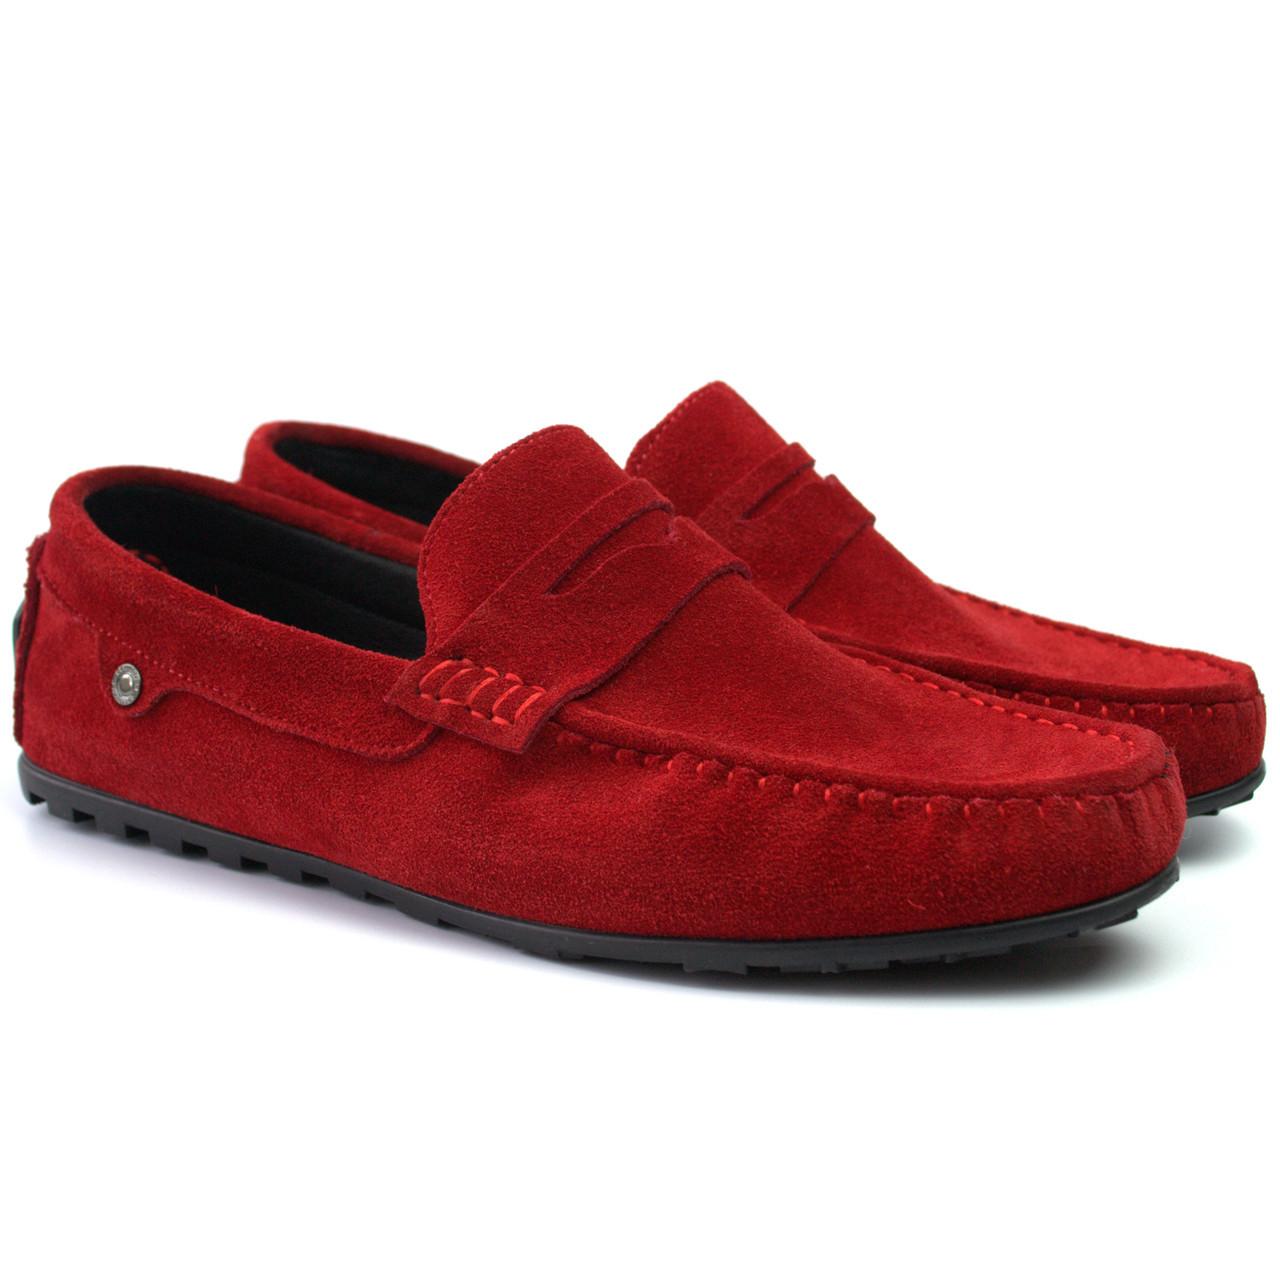 Красные замшевые мокасины мужская обувь большой размер ETHEREAL Ferarri Barn Red Vel BS Rosso Avangard